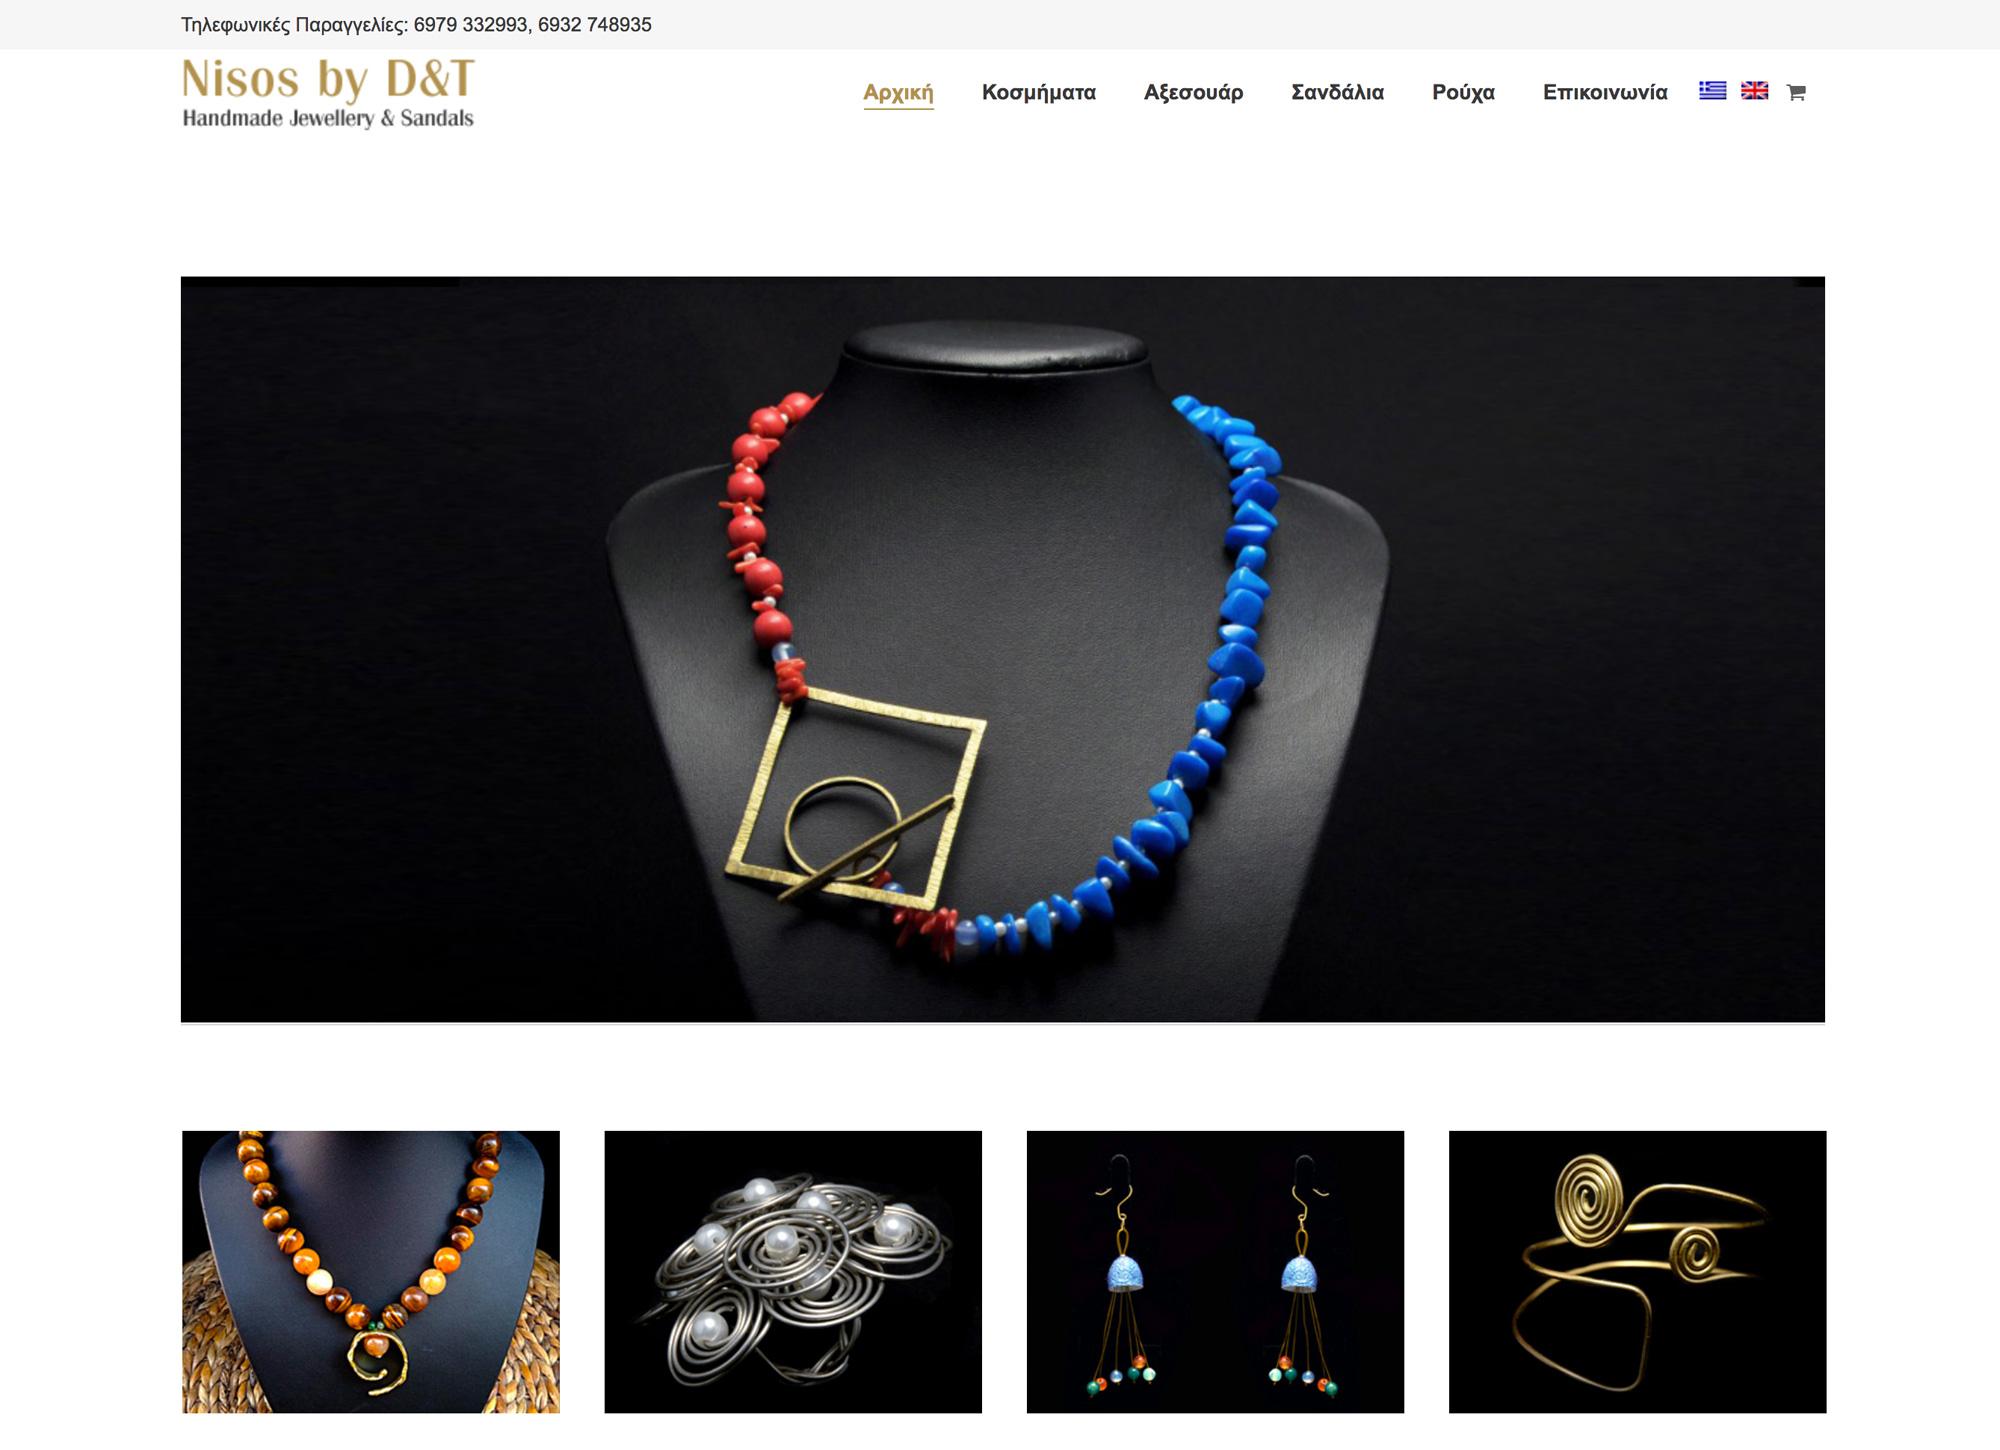 Nisos Jewellery & Sandals eShop development